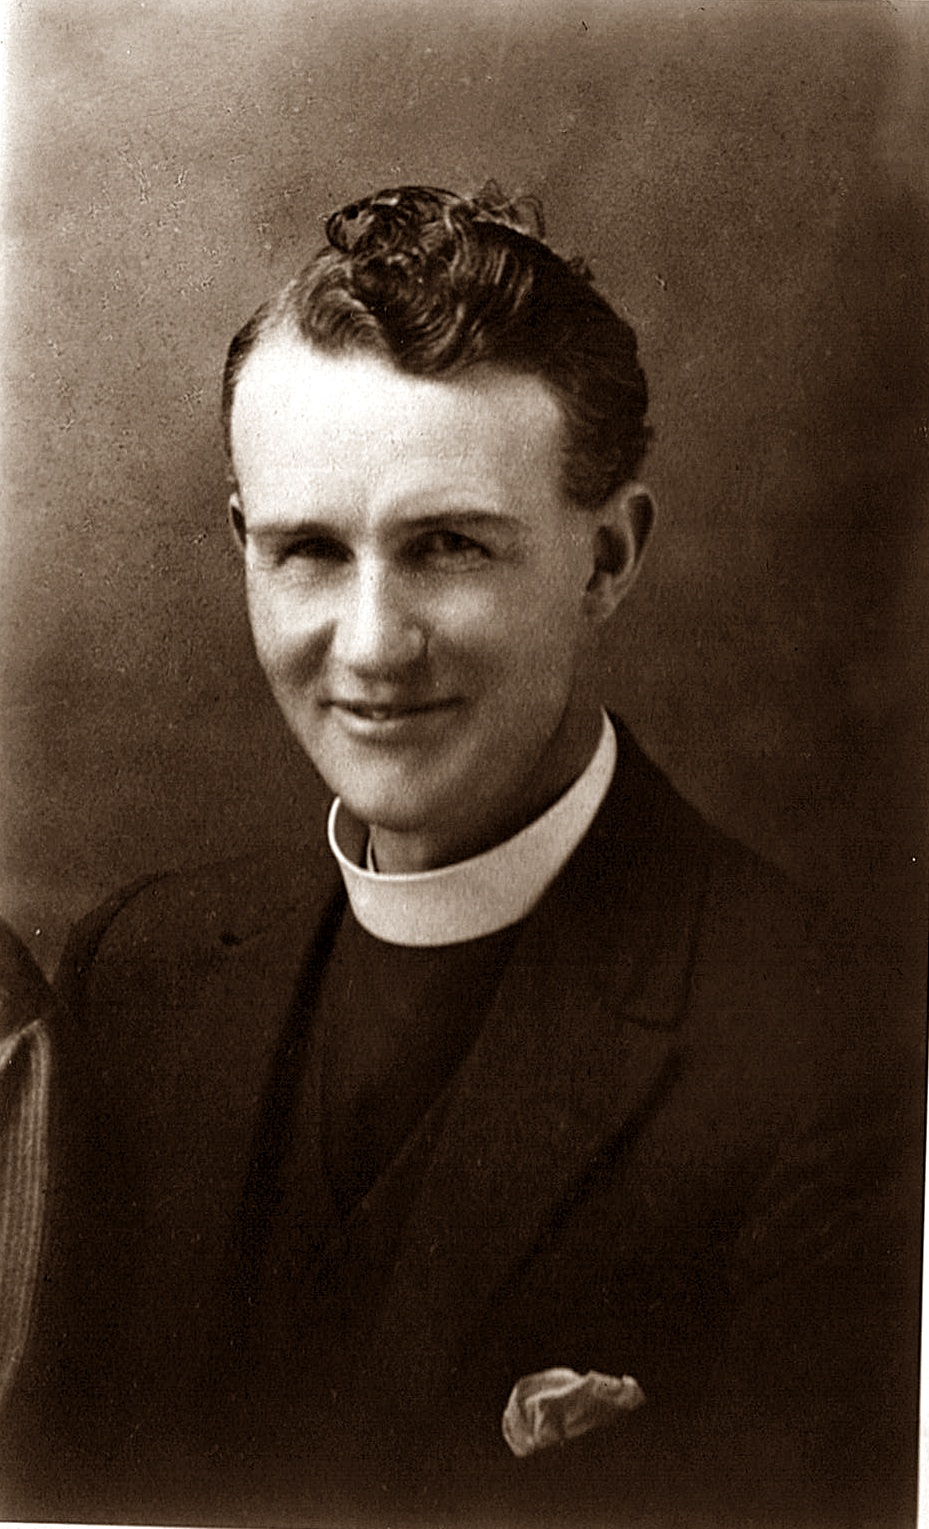 Rev. J. Rhedynog Evans